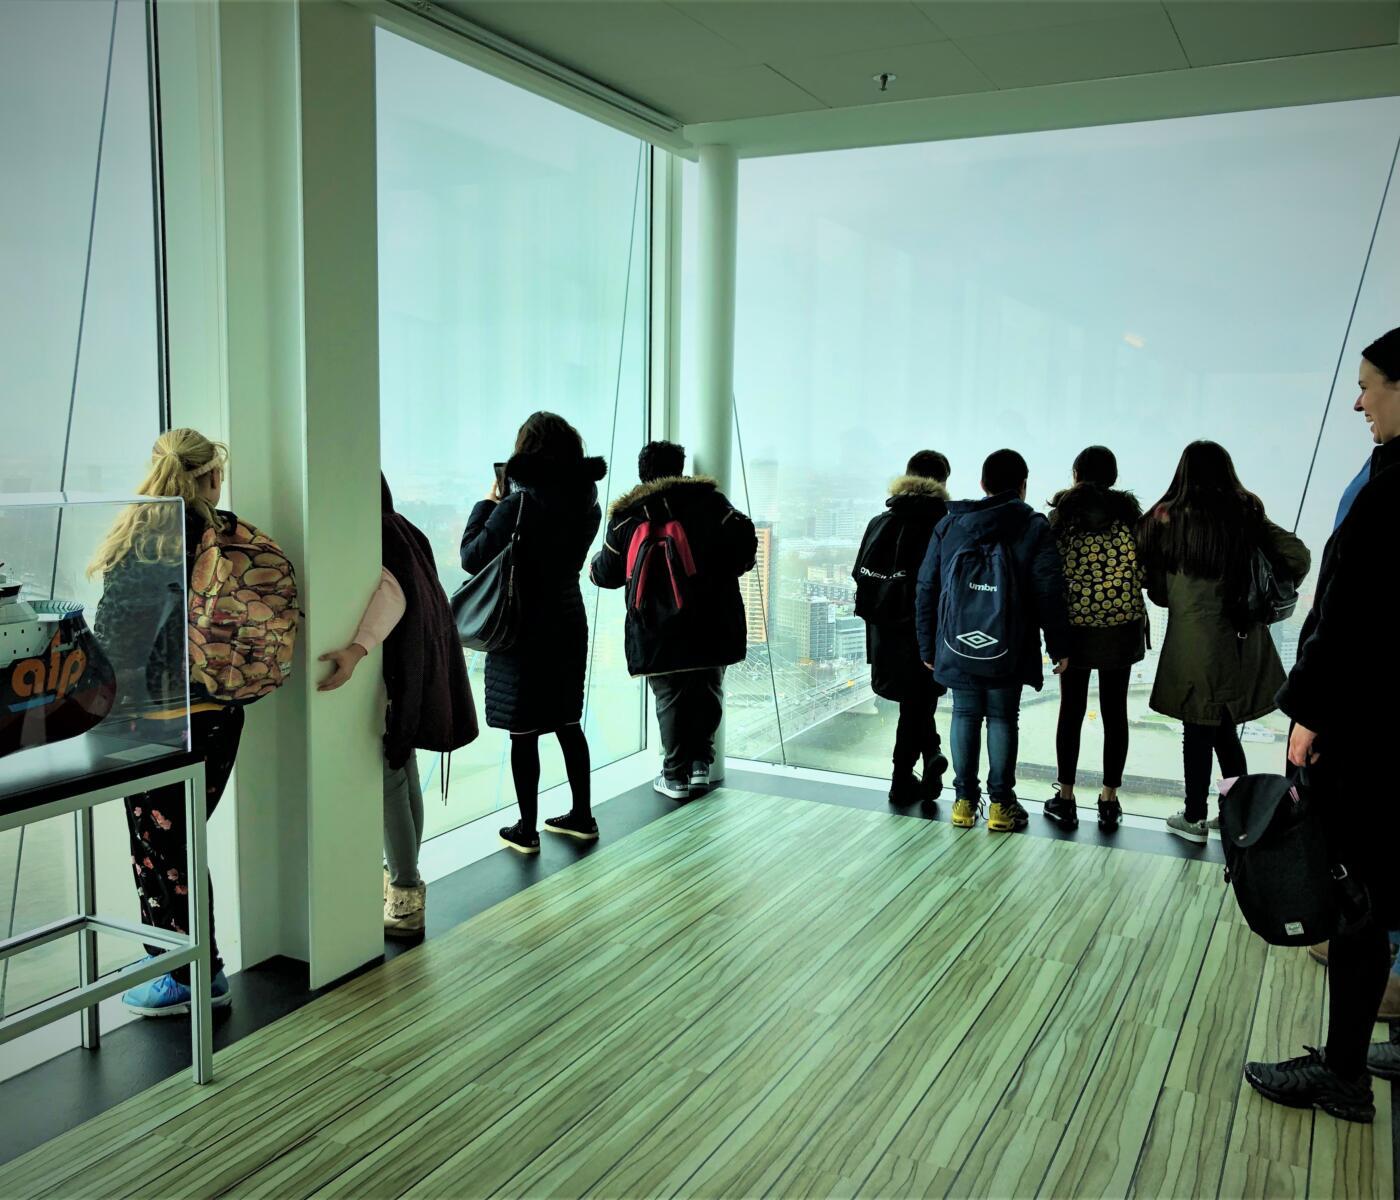 IMC-Weekendschool-at-ALP-office-MAR2019.jpg